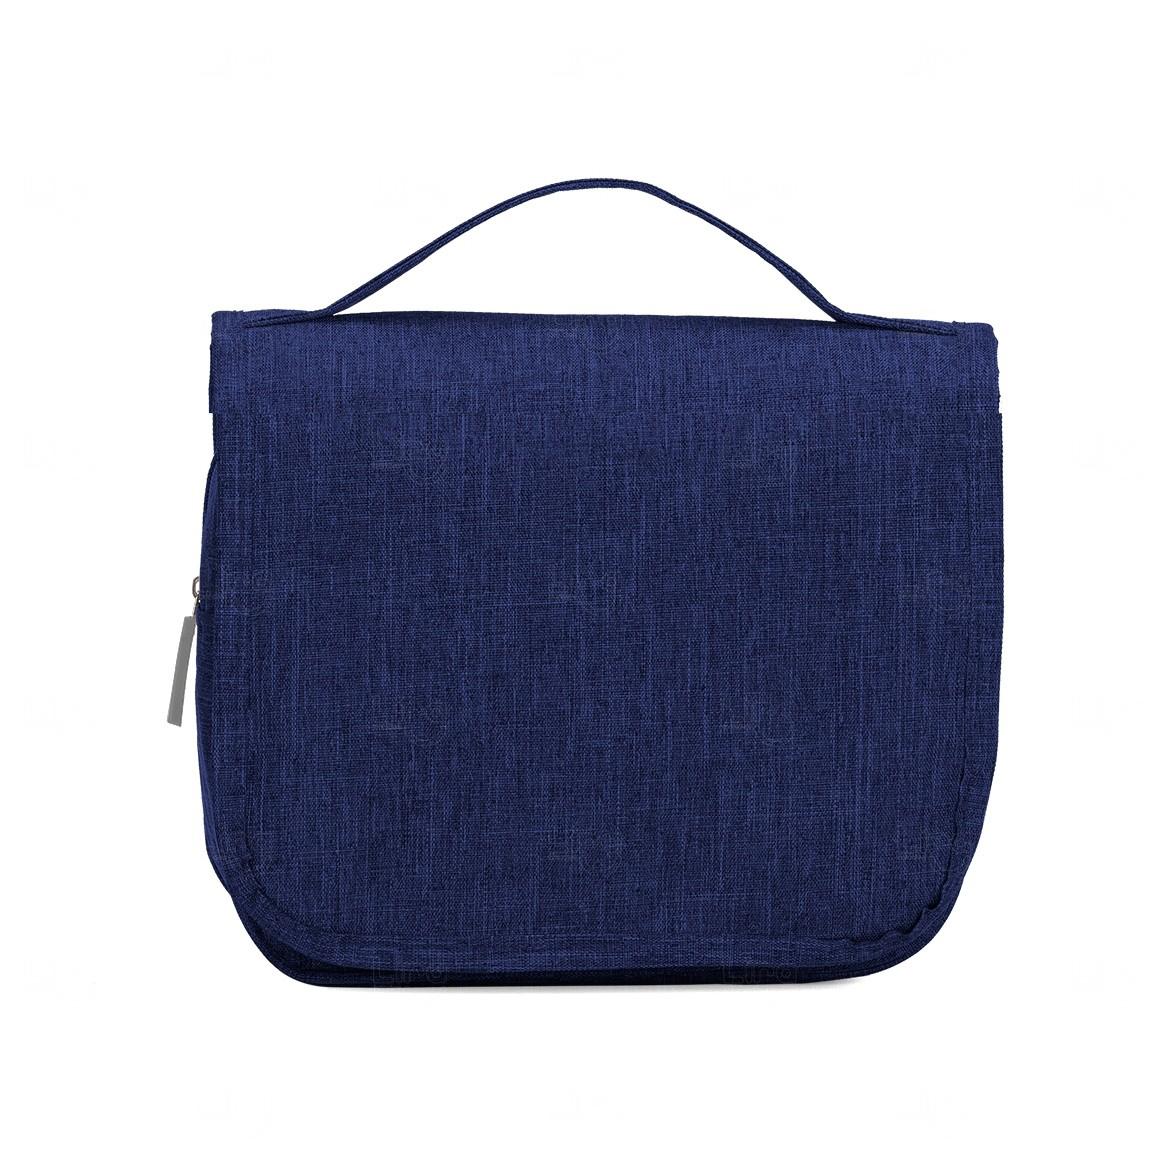 Necessaire Organizadora Personalizada Azul